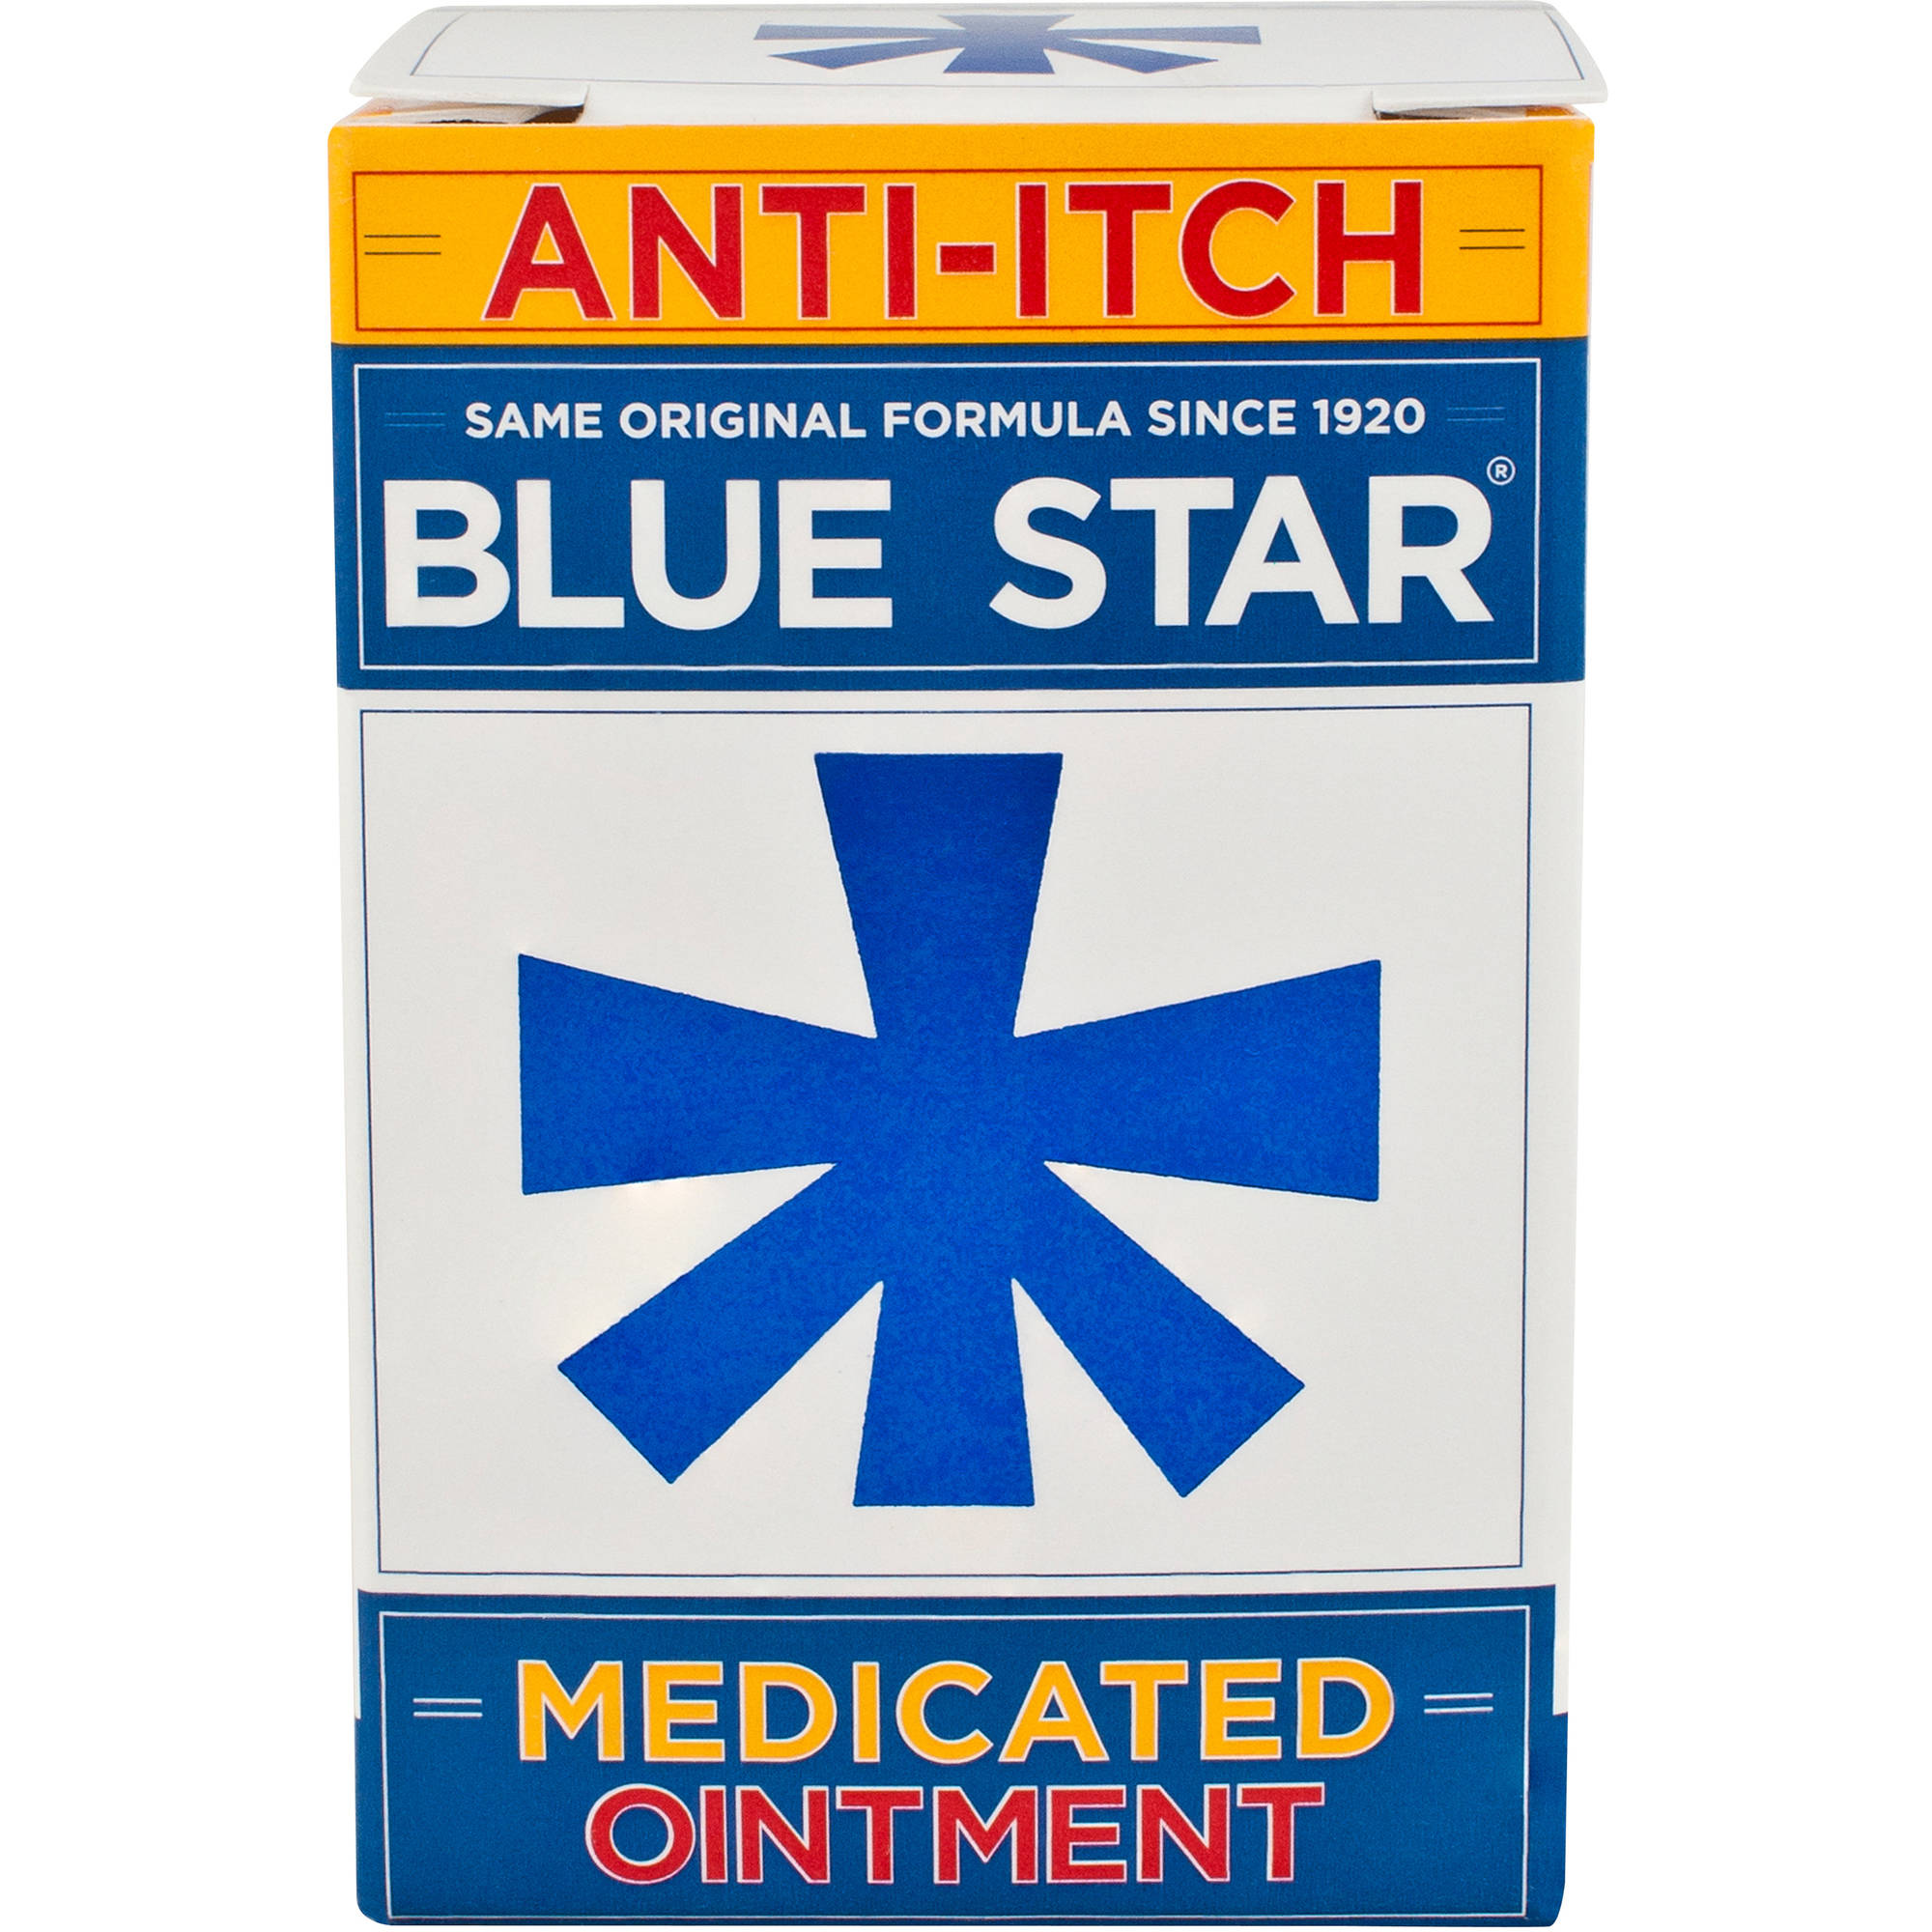 Blue Star Anti Itch Ointment, 2 oz Jar